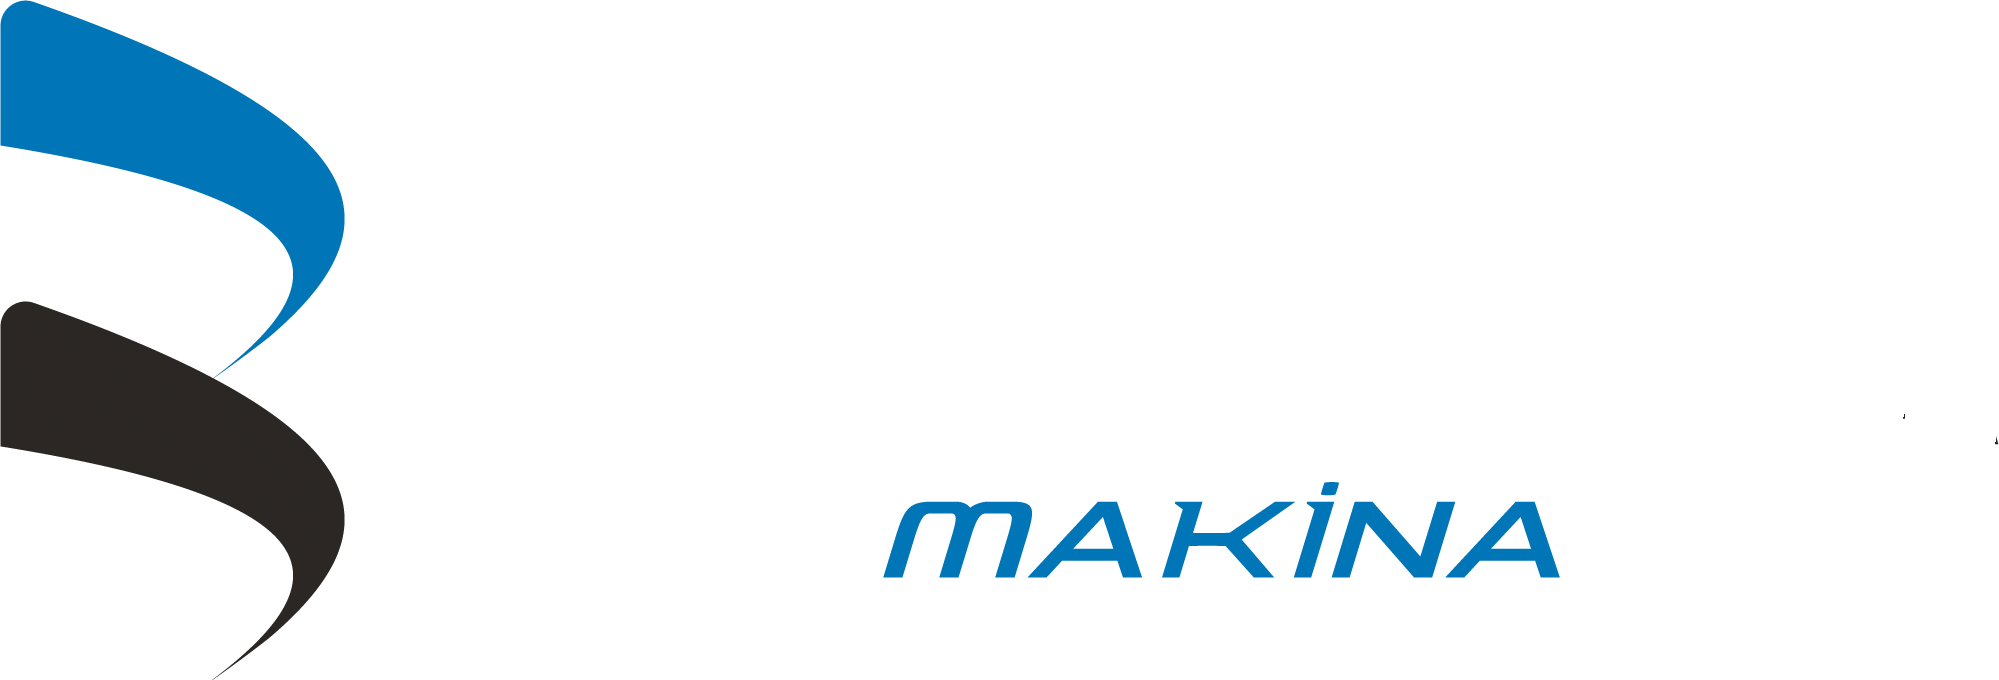 Boneska Makina